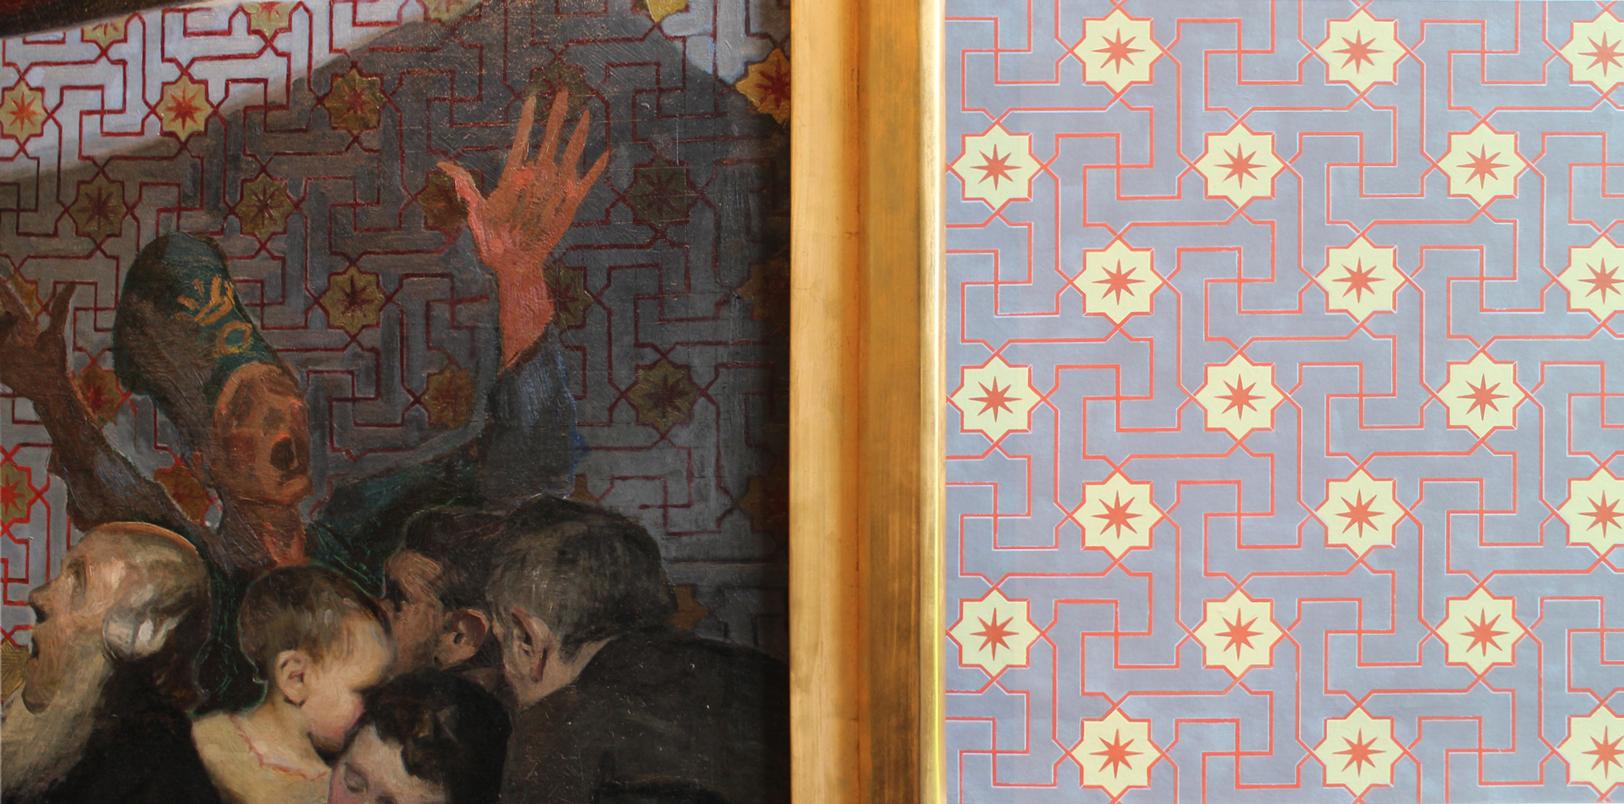 Willumsen Alhambratapet til højre for billedet er lavet af Lone Simonsen LLZ TAPET